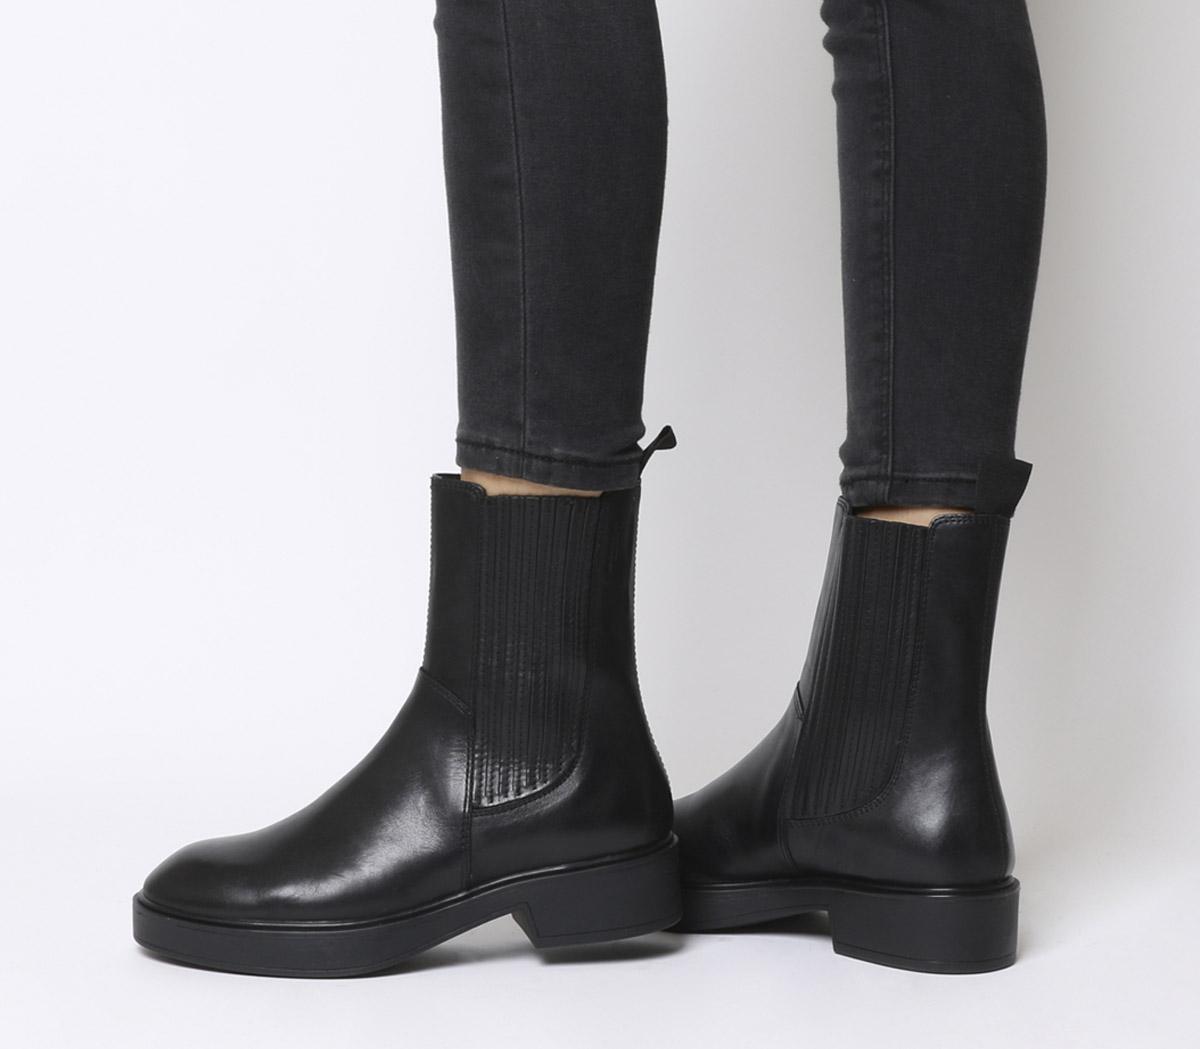 Vagabond Diane High Chelsea Boots Black